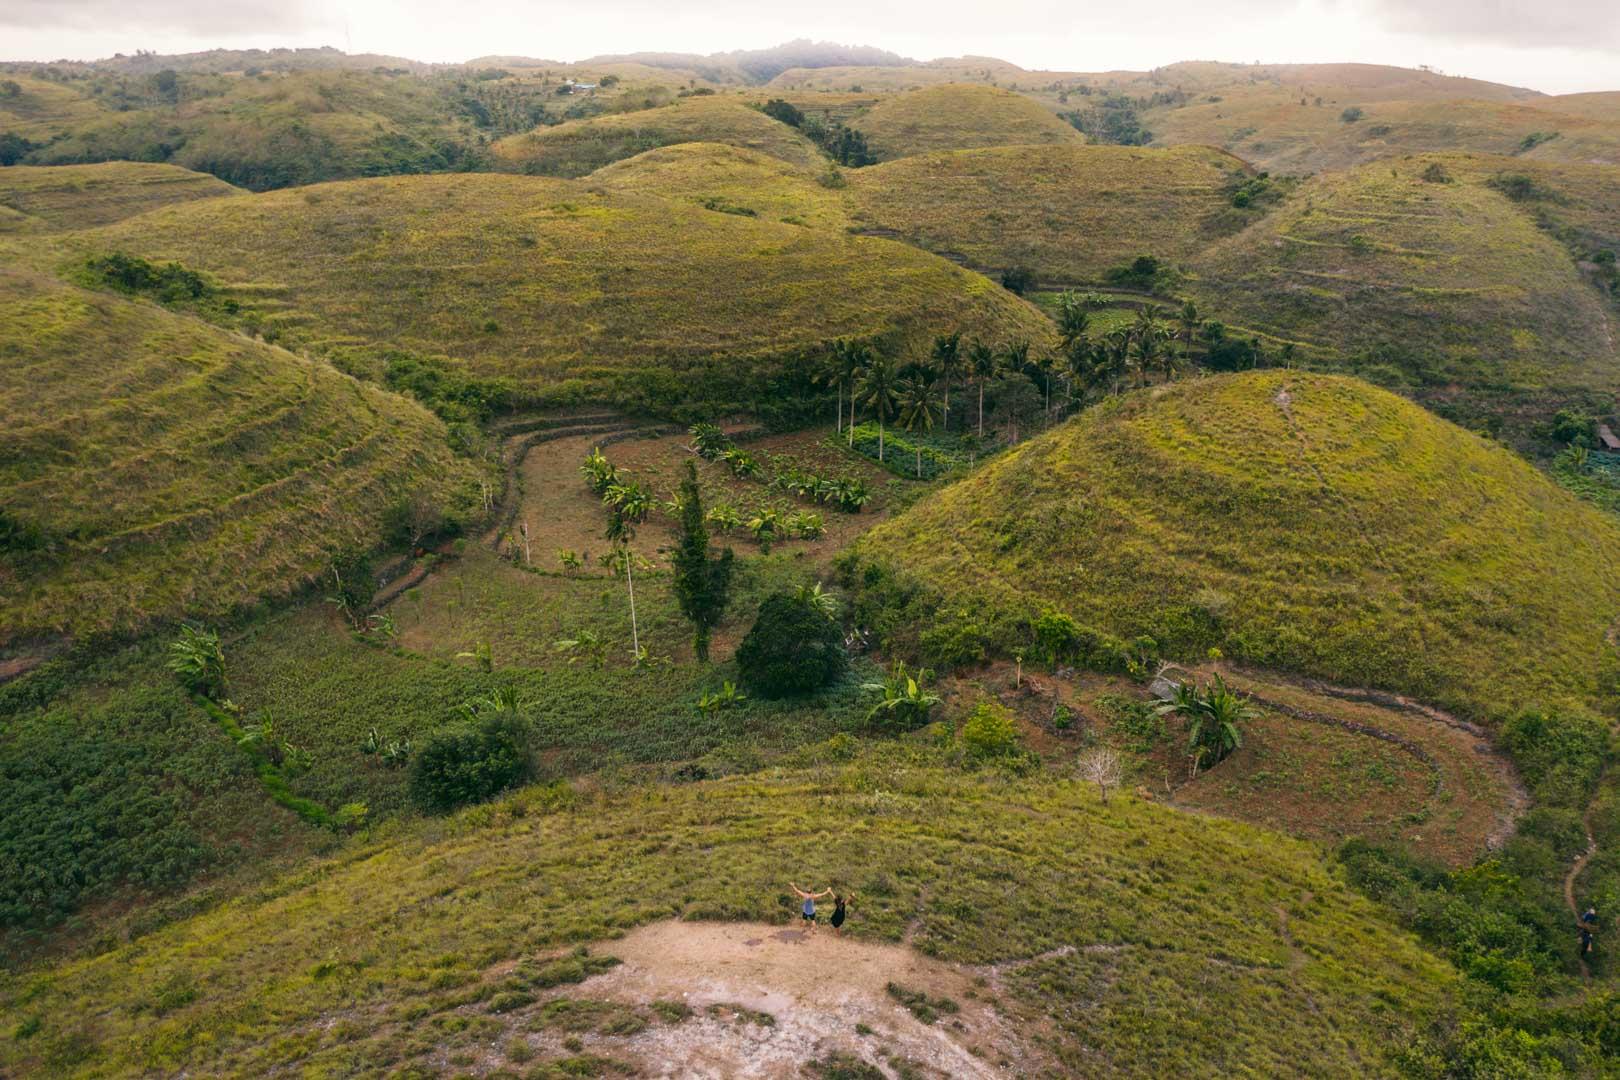 Teletubbies hills drone shot